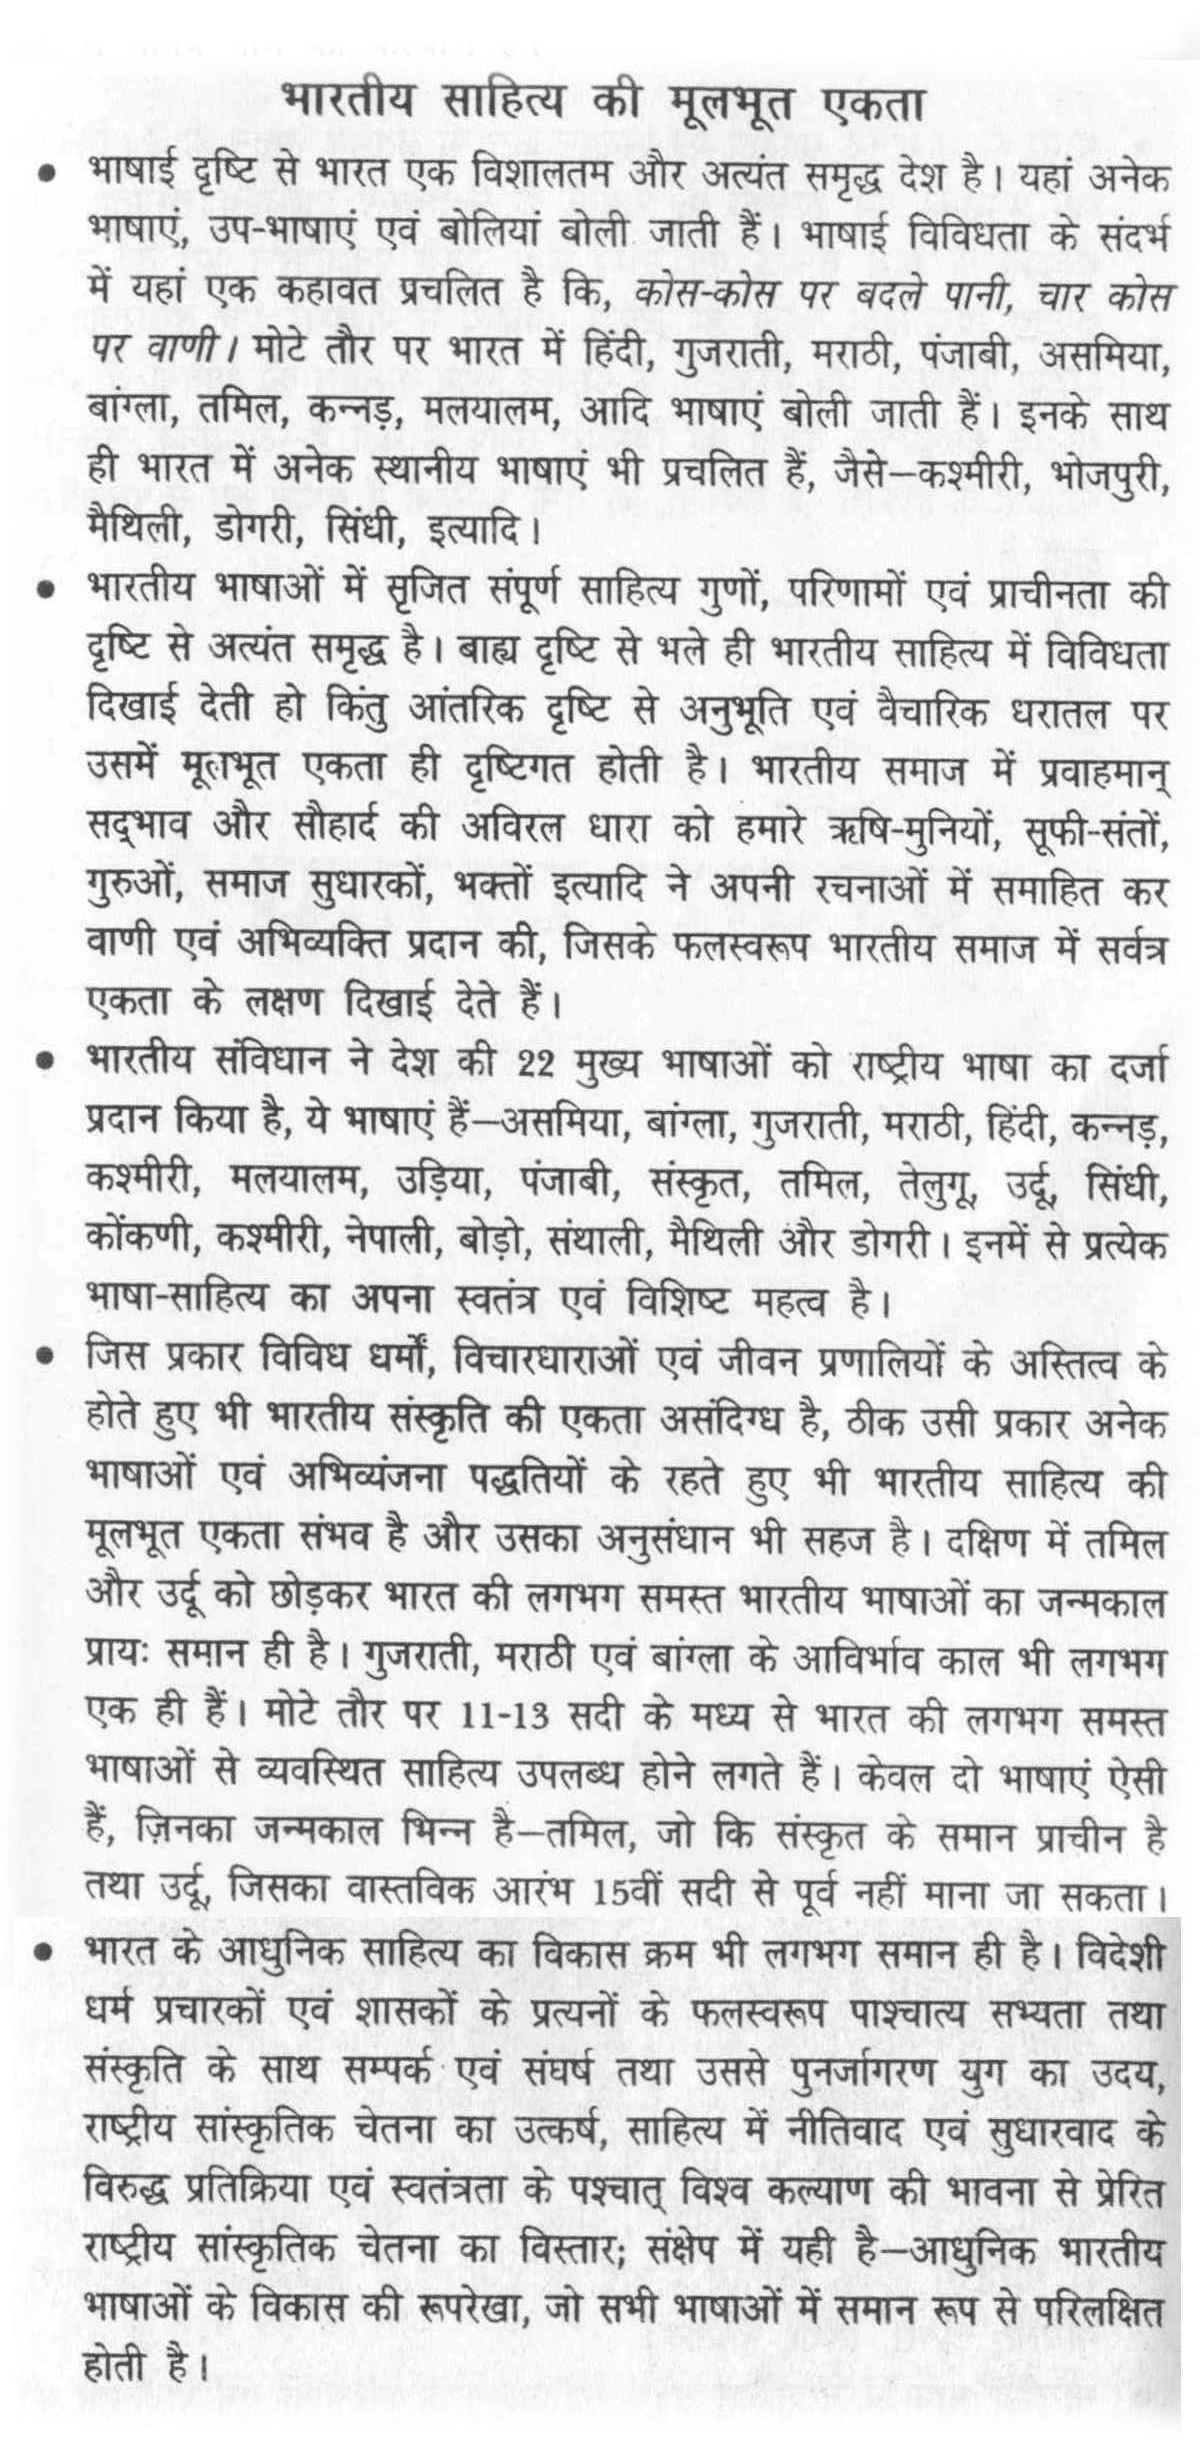 004 Greed Essay Example 11 Thumb2 Awful Greedy Dog In Hindi Topics Is A Curse